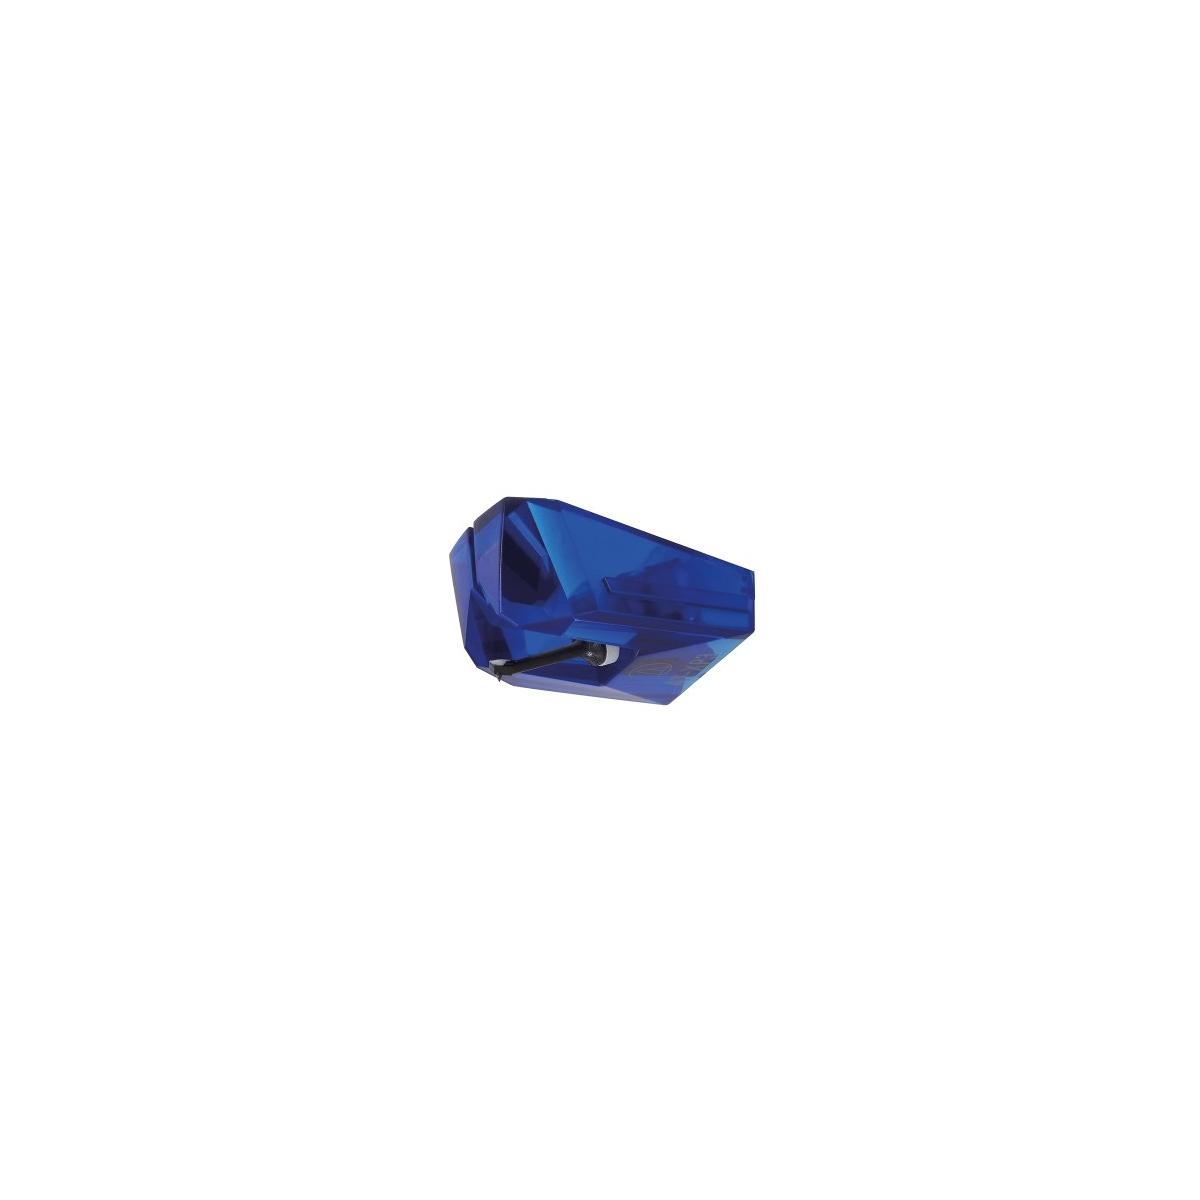 Diamants pour platines vinyles - Audio-Technica - ATN-XP3